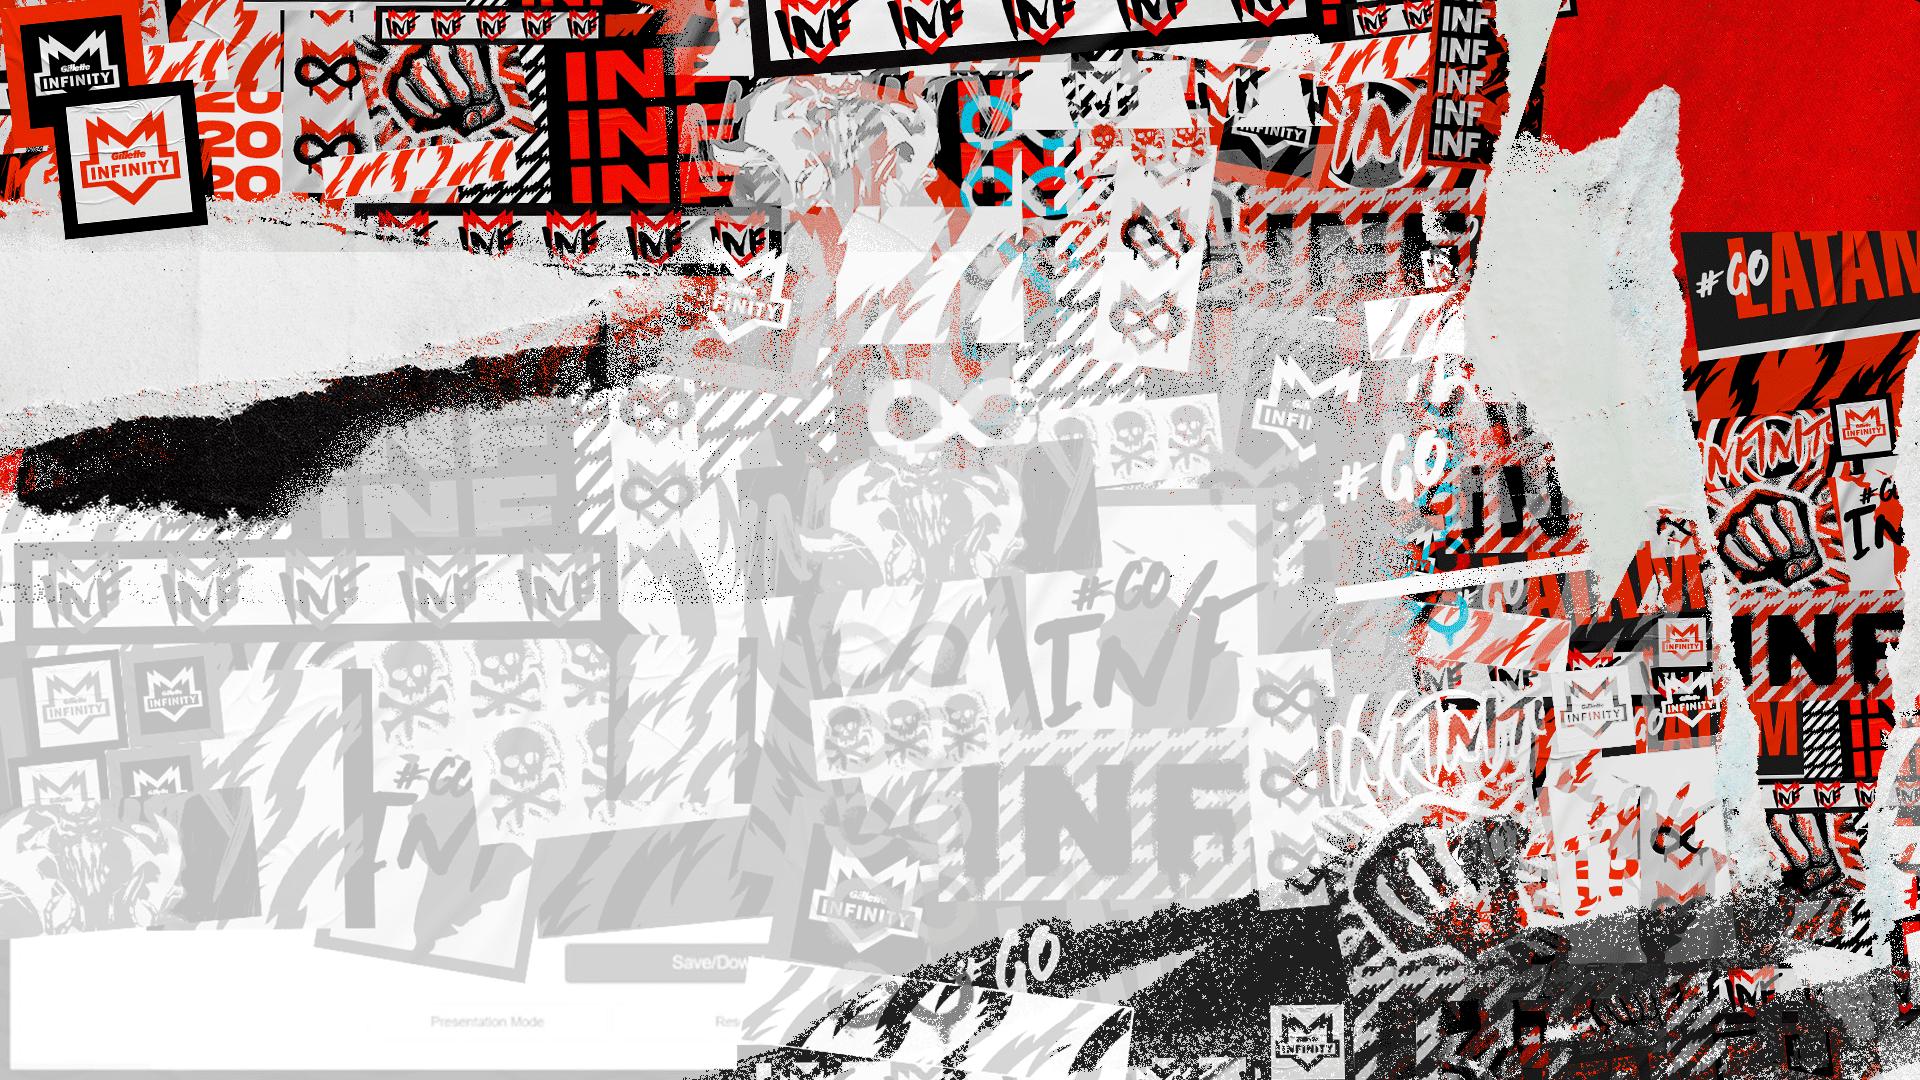 Team Wallpaper - Infinity Esports, Season 2, #1